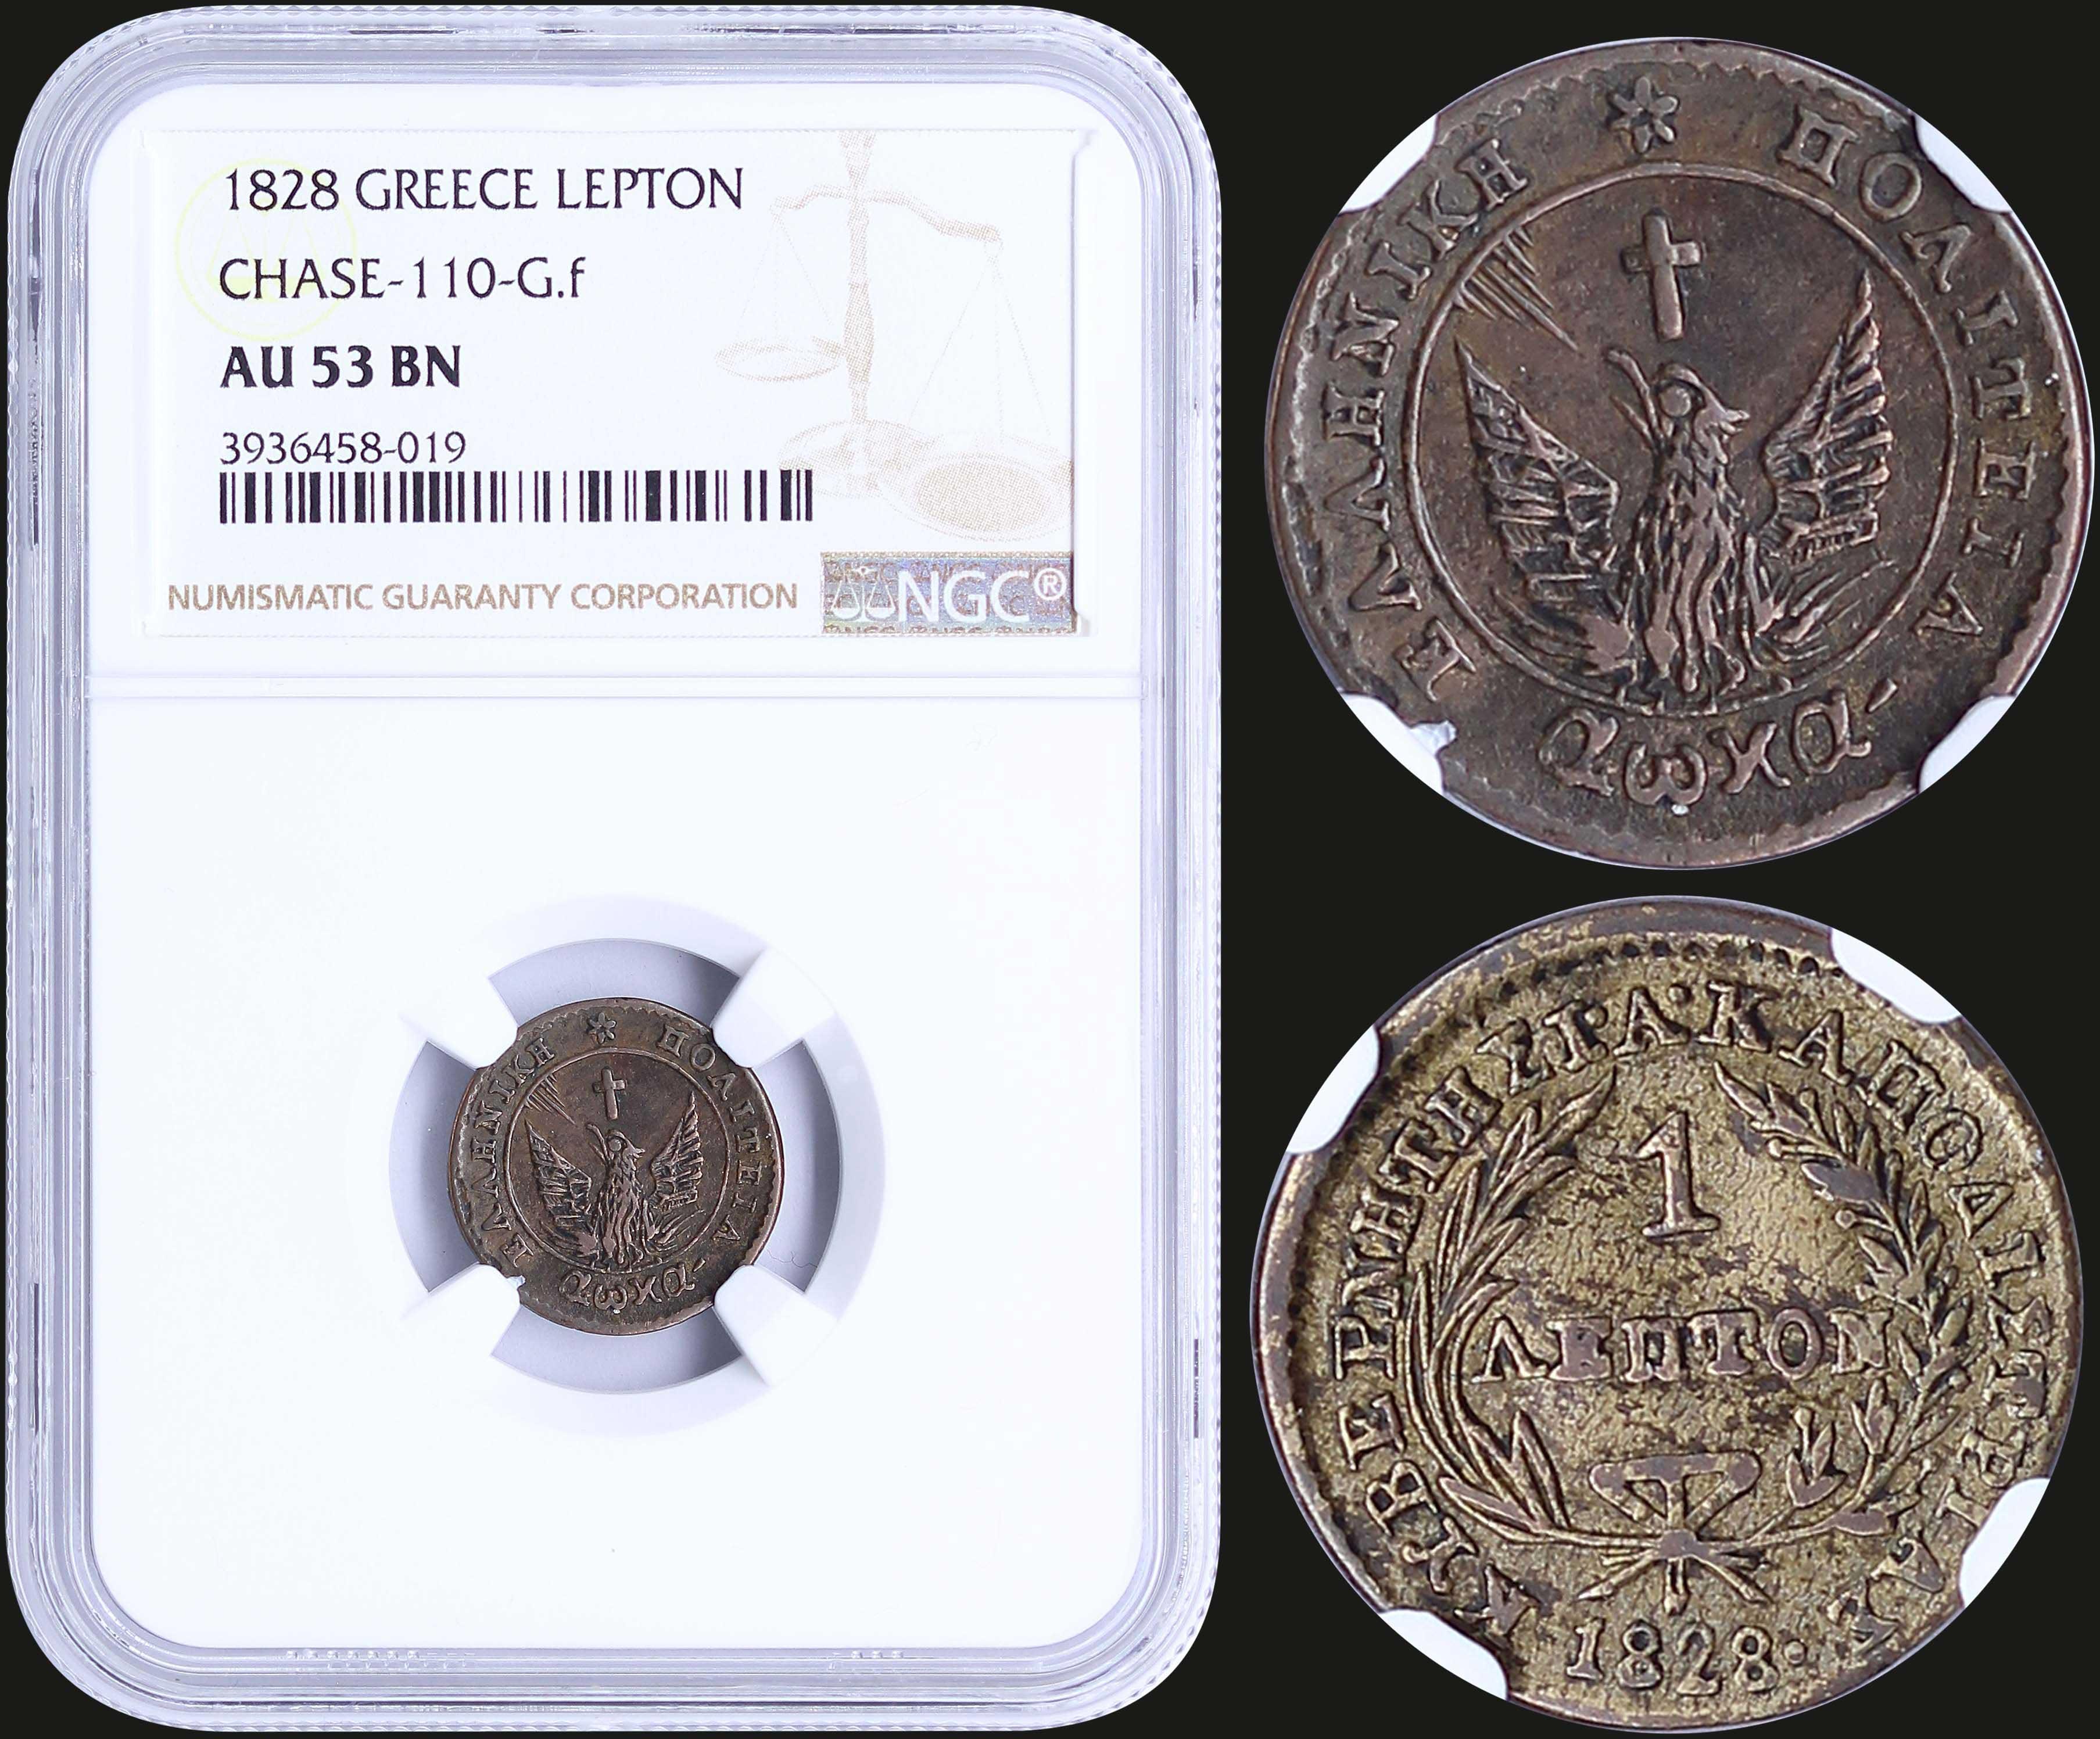 Lot 6008 - -  COINS & TOKENS governor capodistrias -  A. Karamitsos Public & Live Bid Auction 636 Coins, Medals & Banknotes